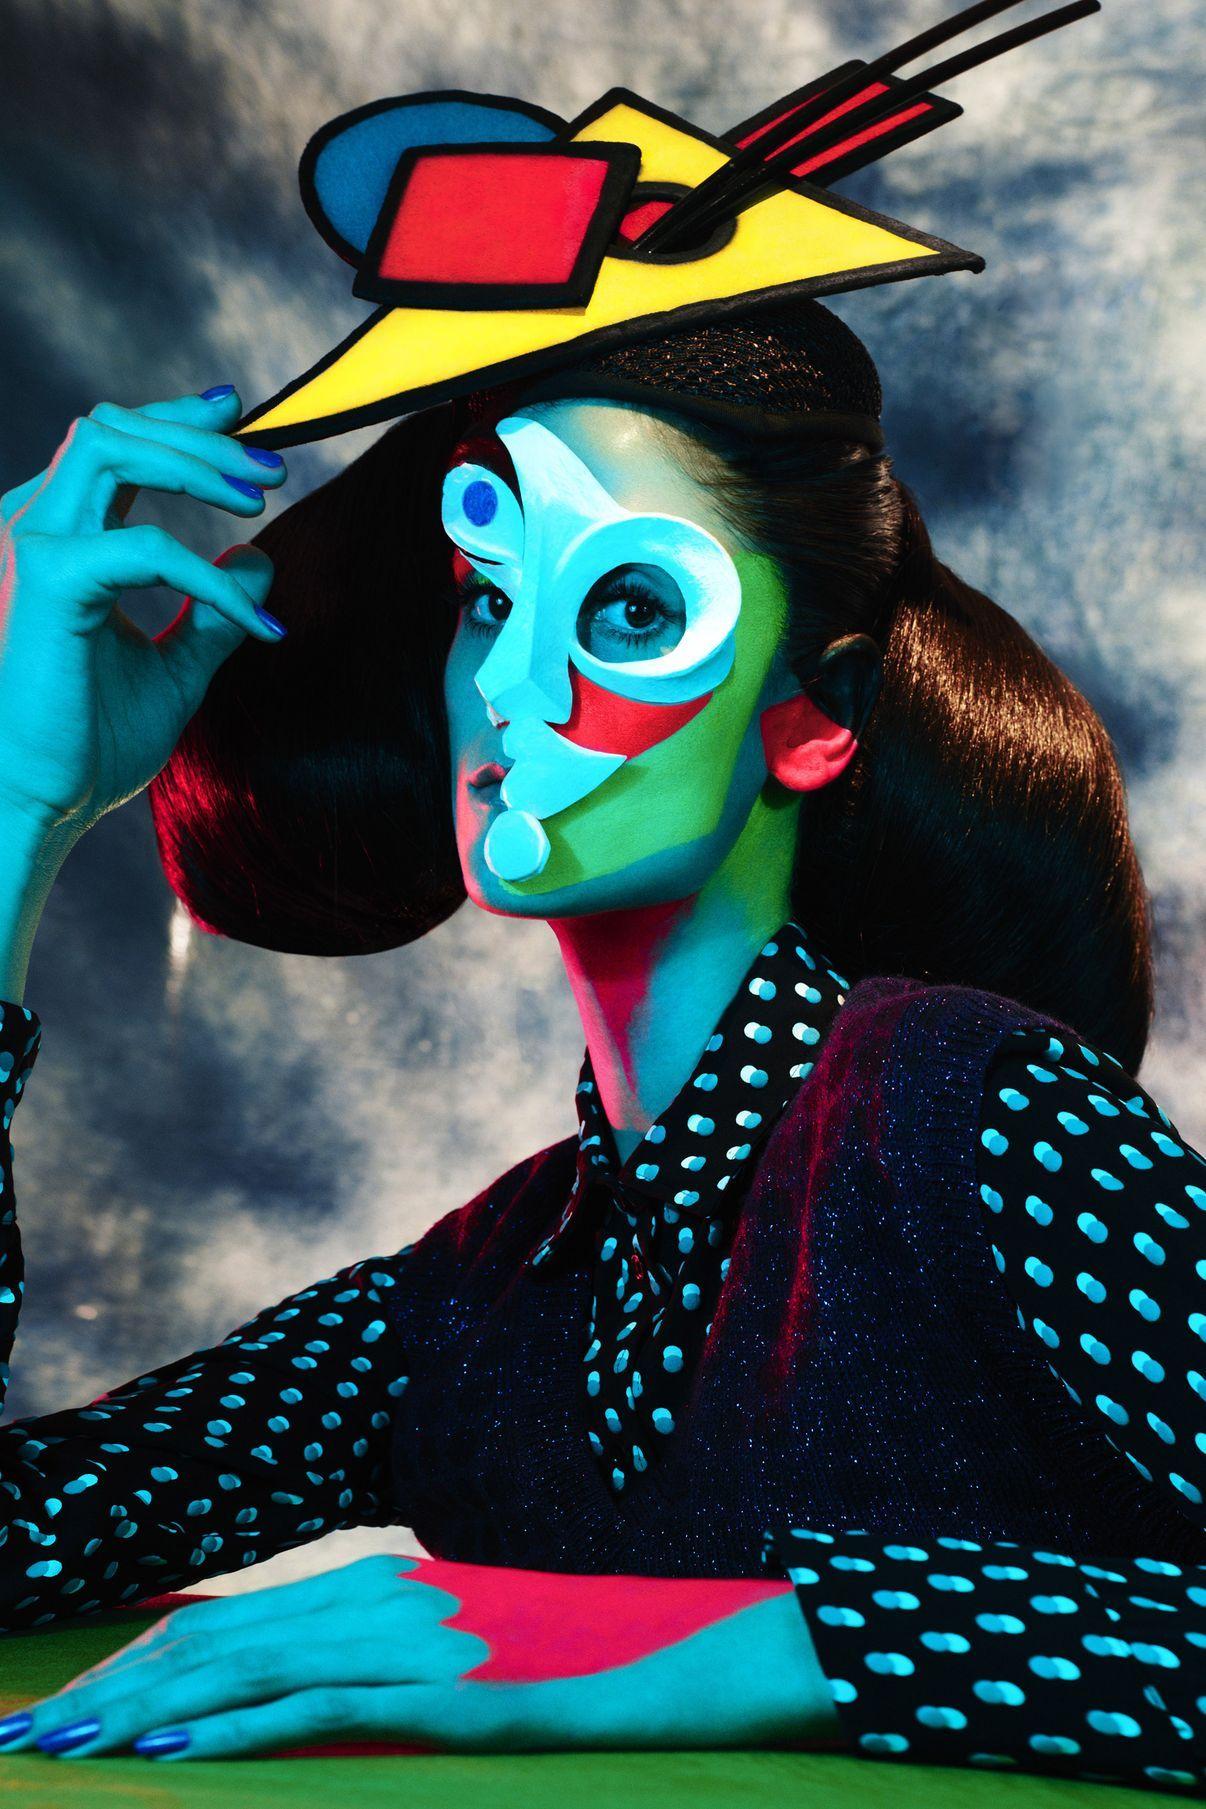 Picasso's Women | Picasso art, Picasso, Harper's bazaar